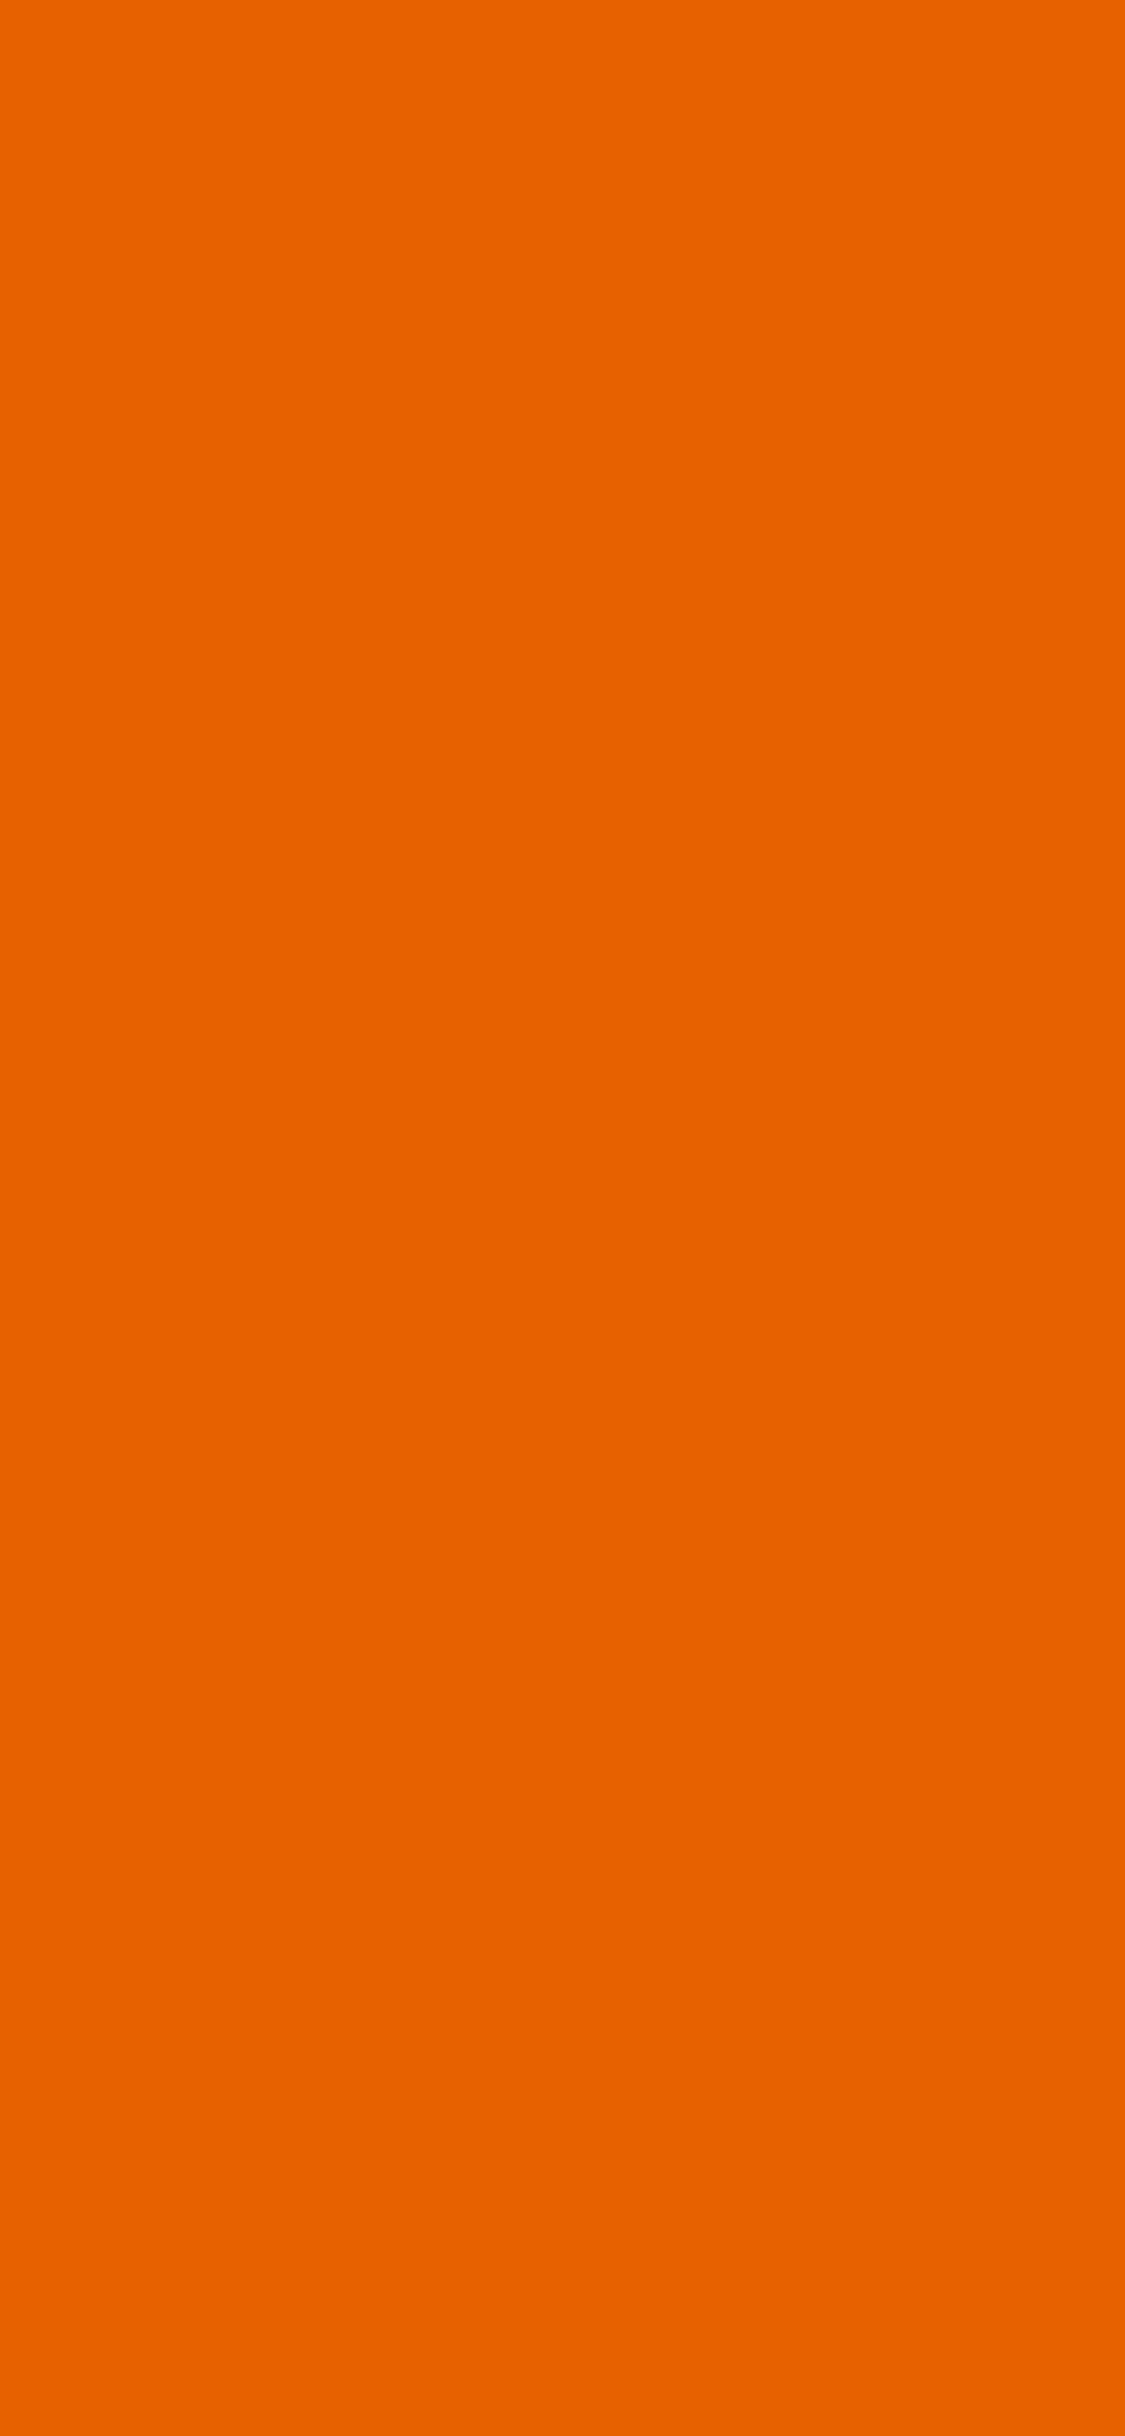 1125x2436 Spanish Orange Solid Color Background